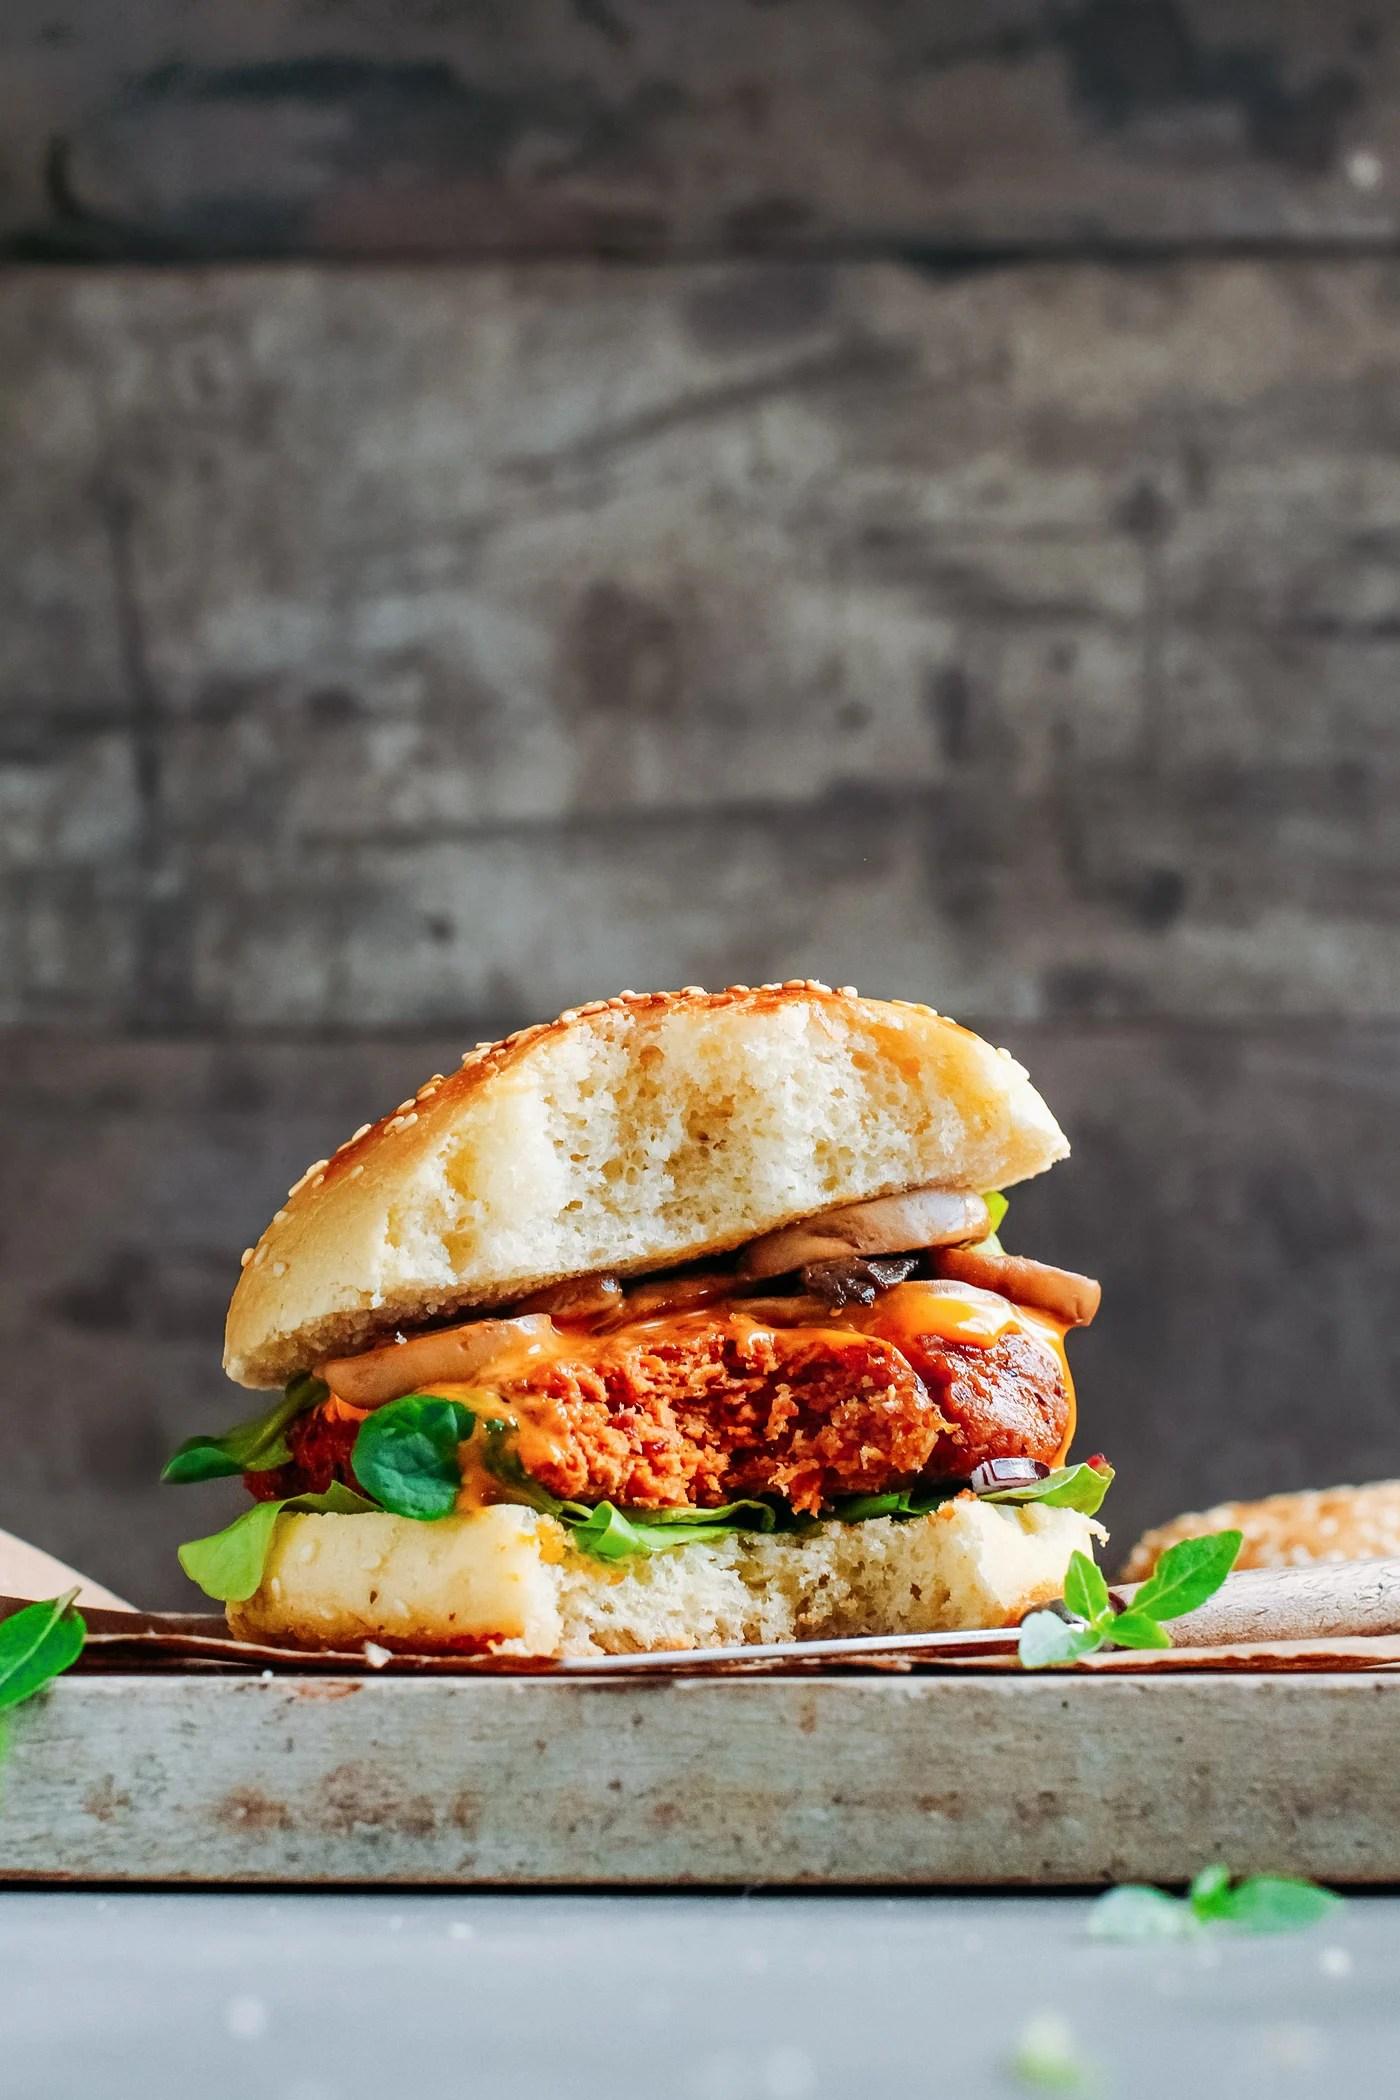 High Protein Vegan Burgers with mushrooms and sriracha mayo sauce.